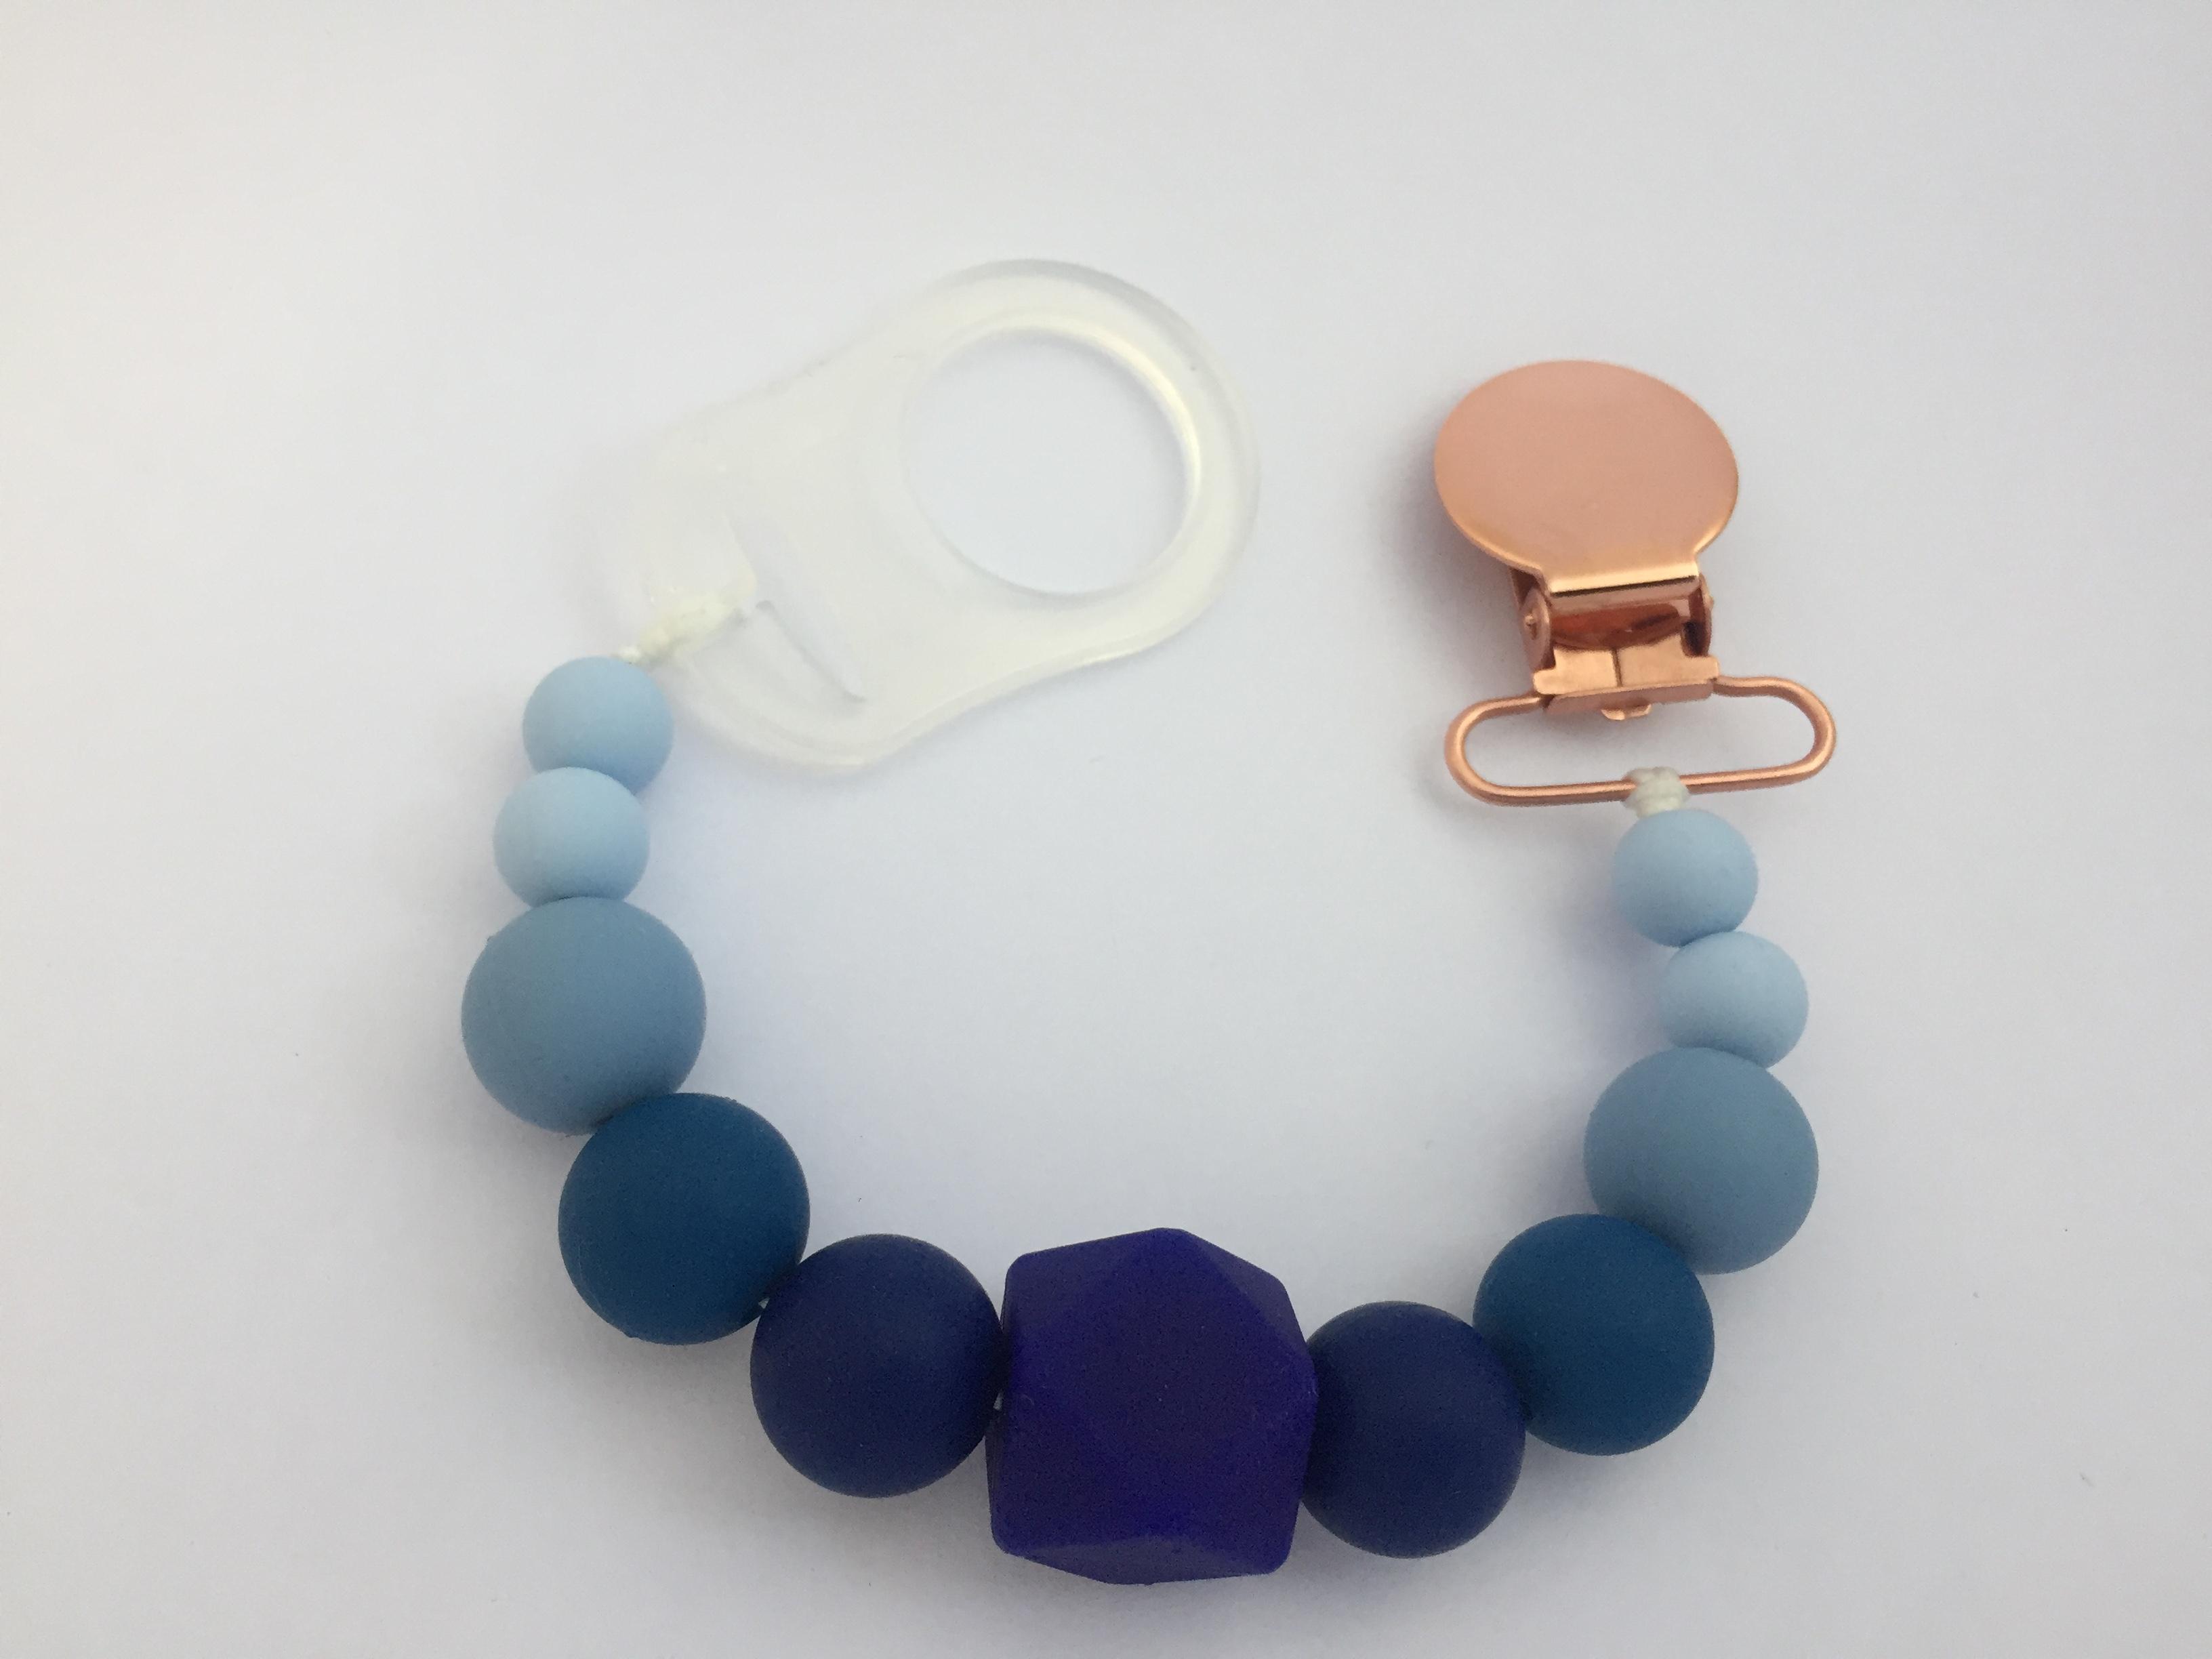 Attache tétine sensoriel dégradé bleu